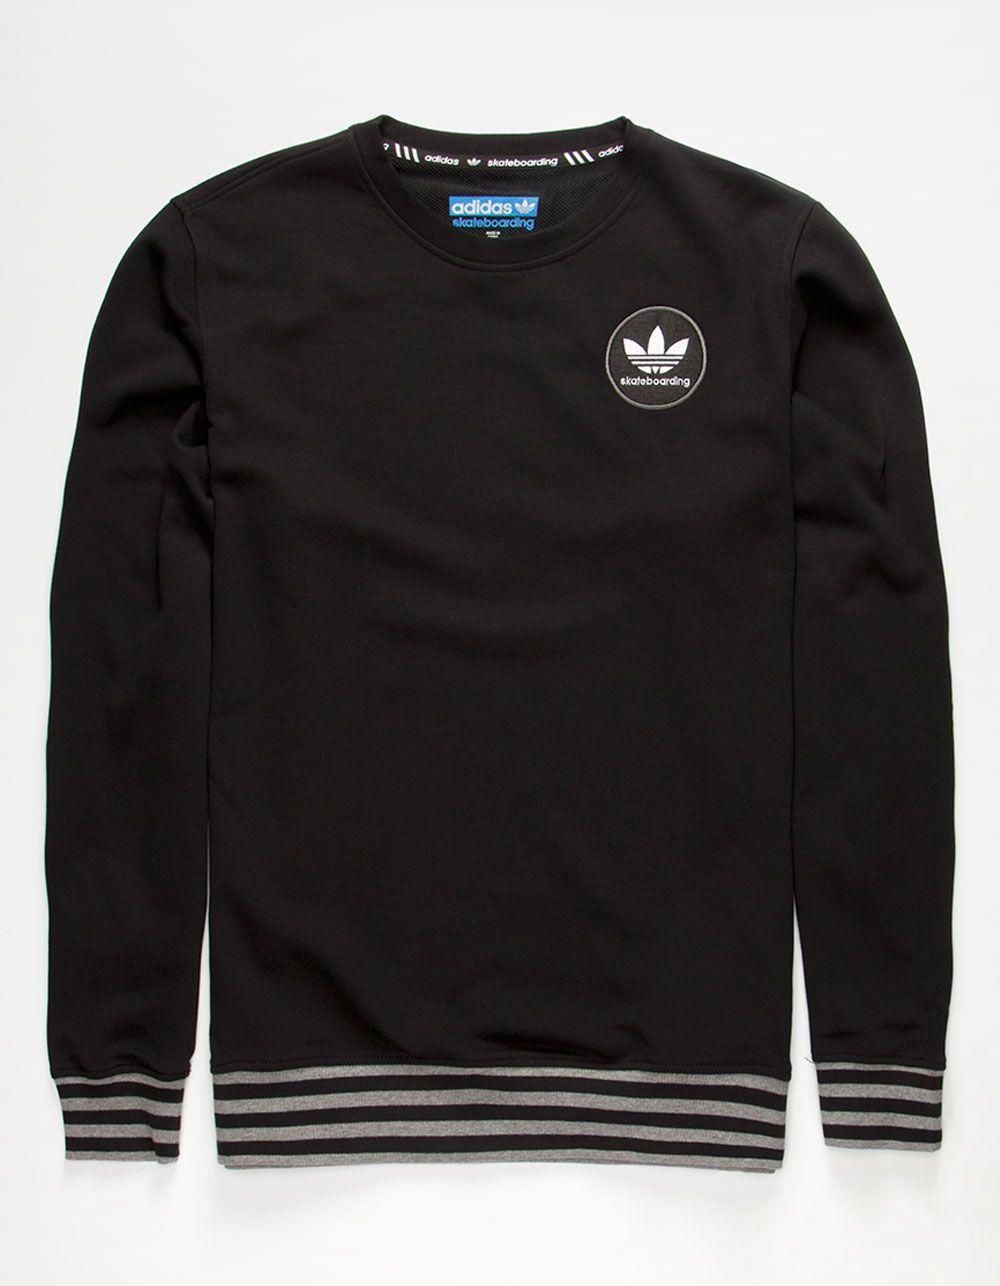 491276c9a3 ADIDAS ADV 2.0 Mens Sweatshirt 249590100 | Sweatshirts | Clothes in ...